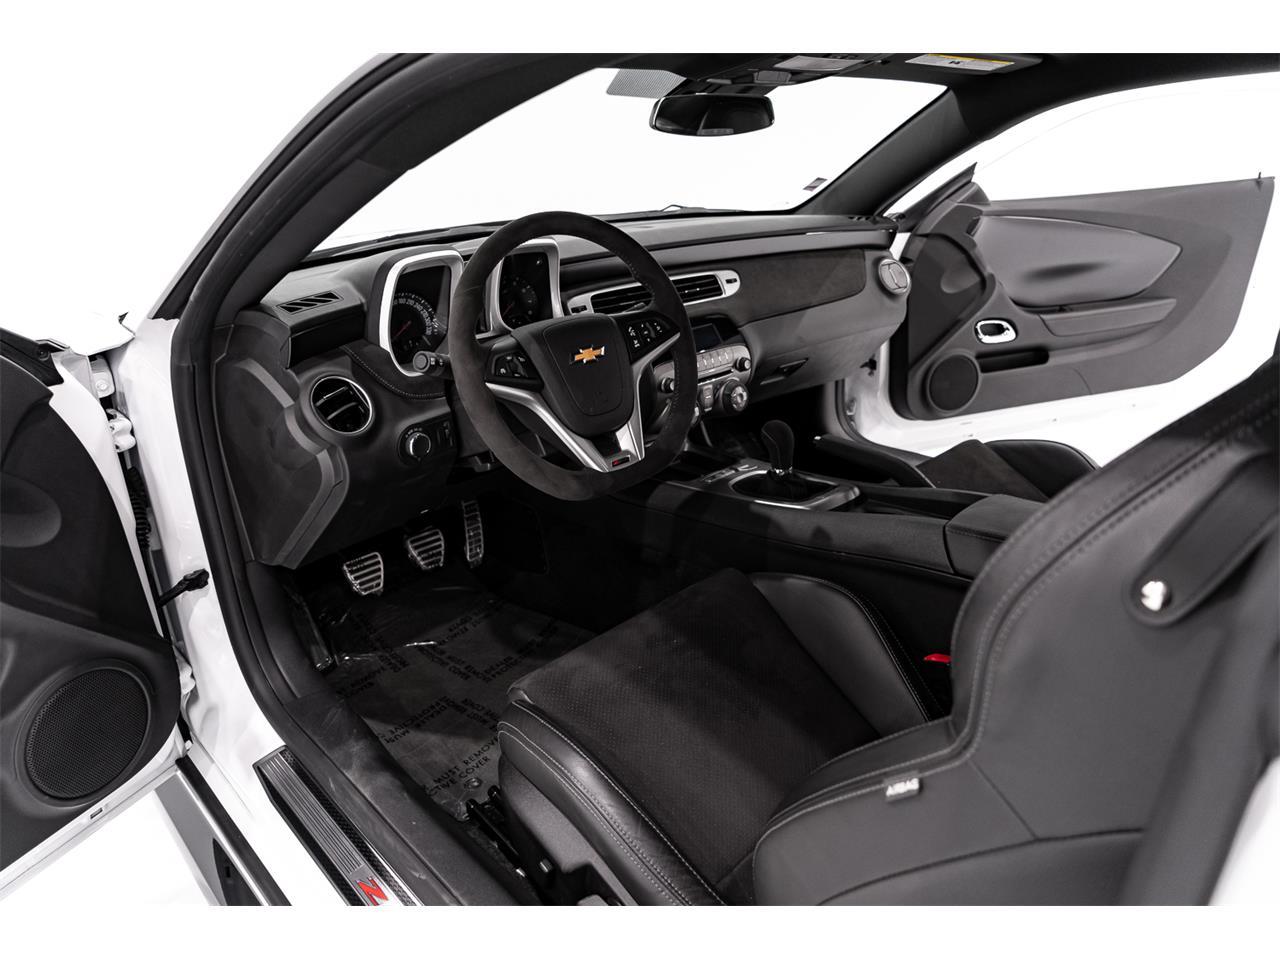 2015 Chevrolet Camaro Z28 (CC-1378089) for sale in Montreal, Quebec